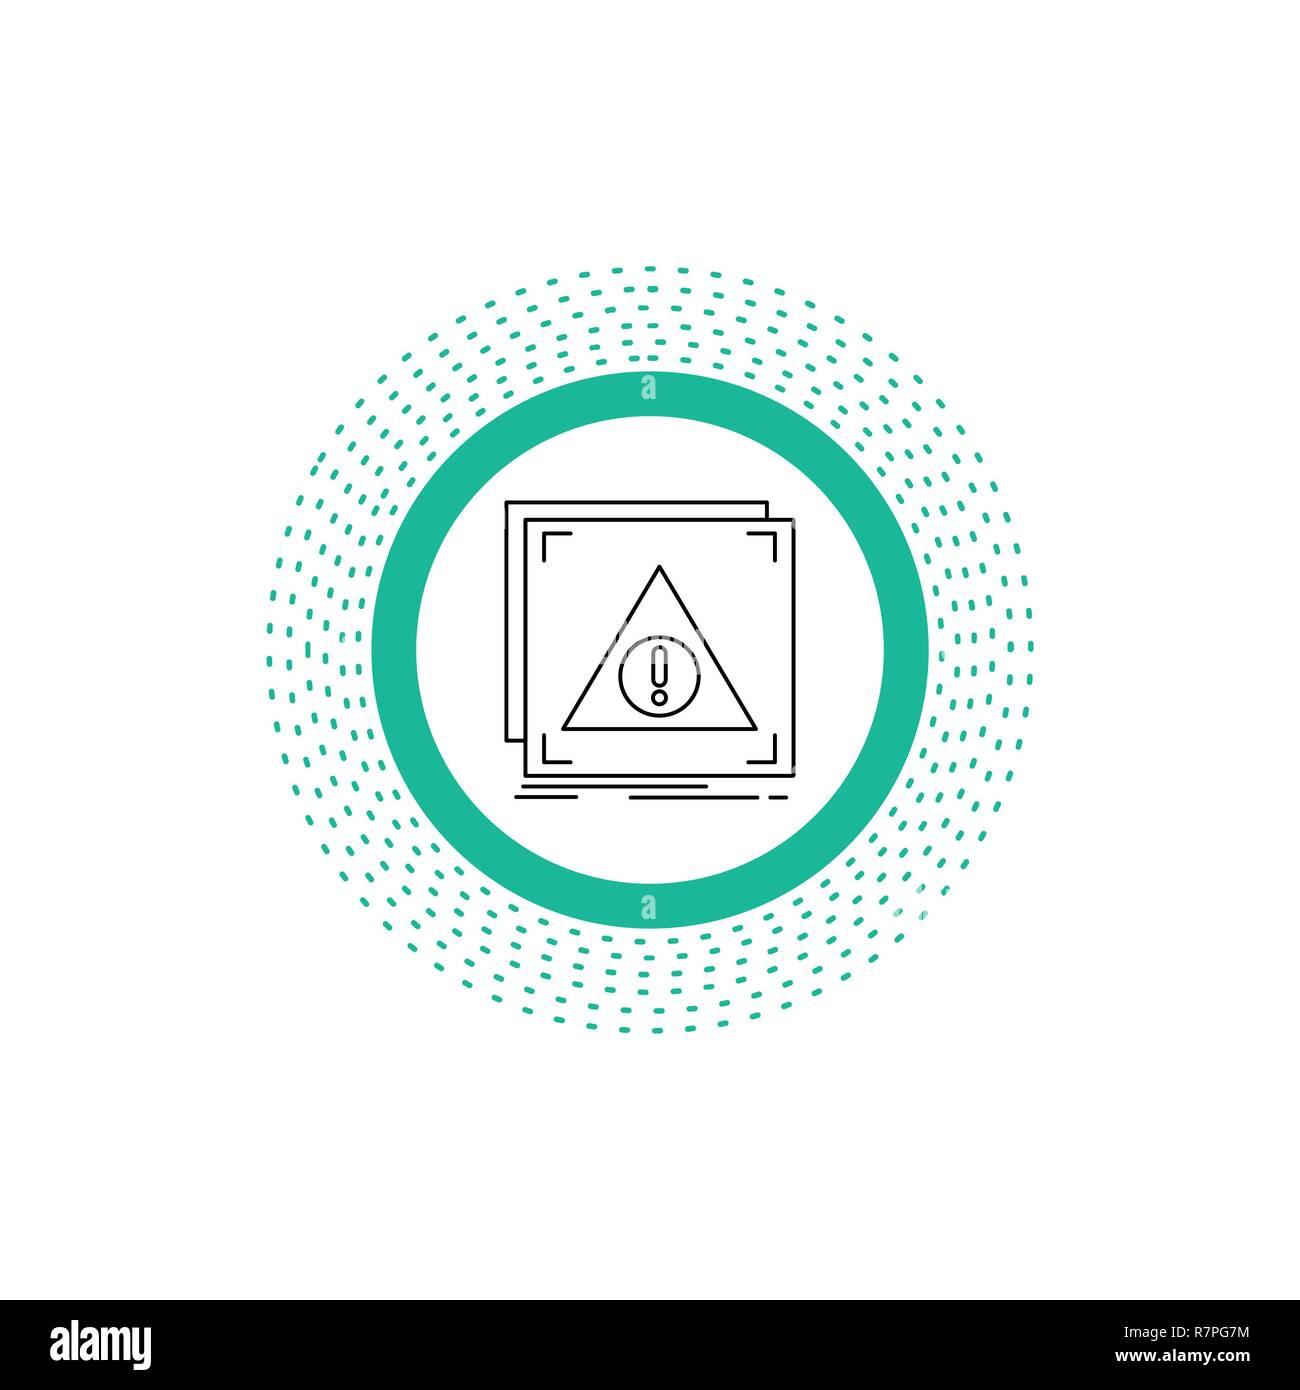 Error, Application, Denied, server, alert Line Icon. Vector isolated illustration - Stock Image